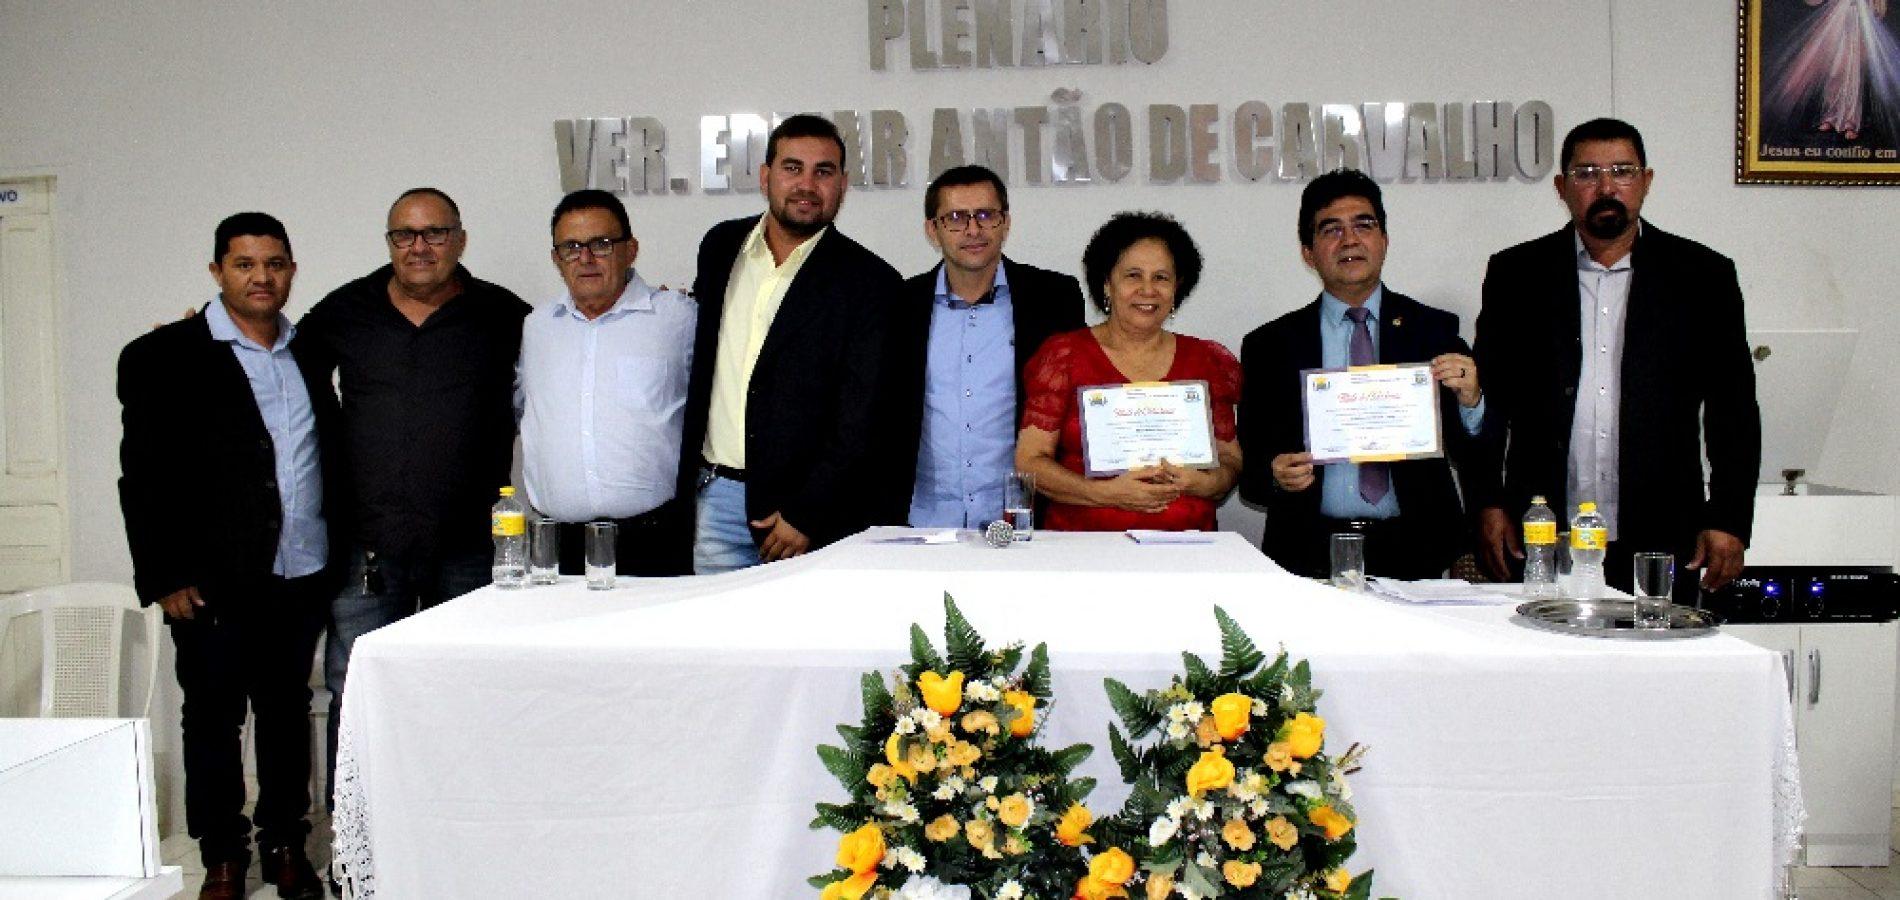 FRANCISCO MACEDO | Câmara entrega Títulos de Cidadania a vice-governadora Regina e ao deputado Limma; fotos